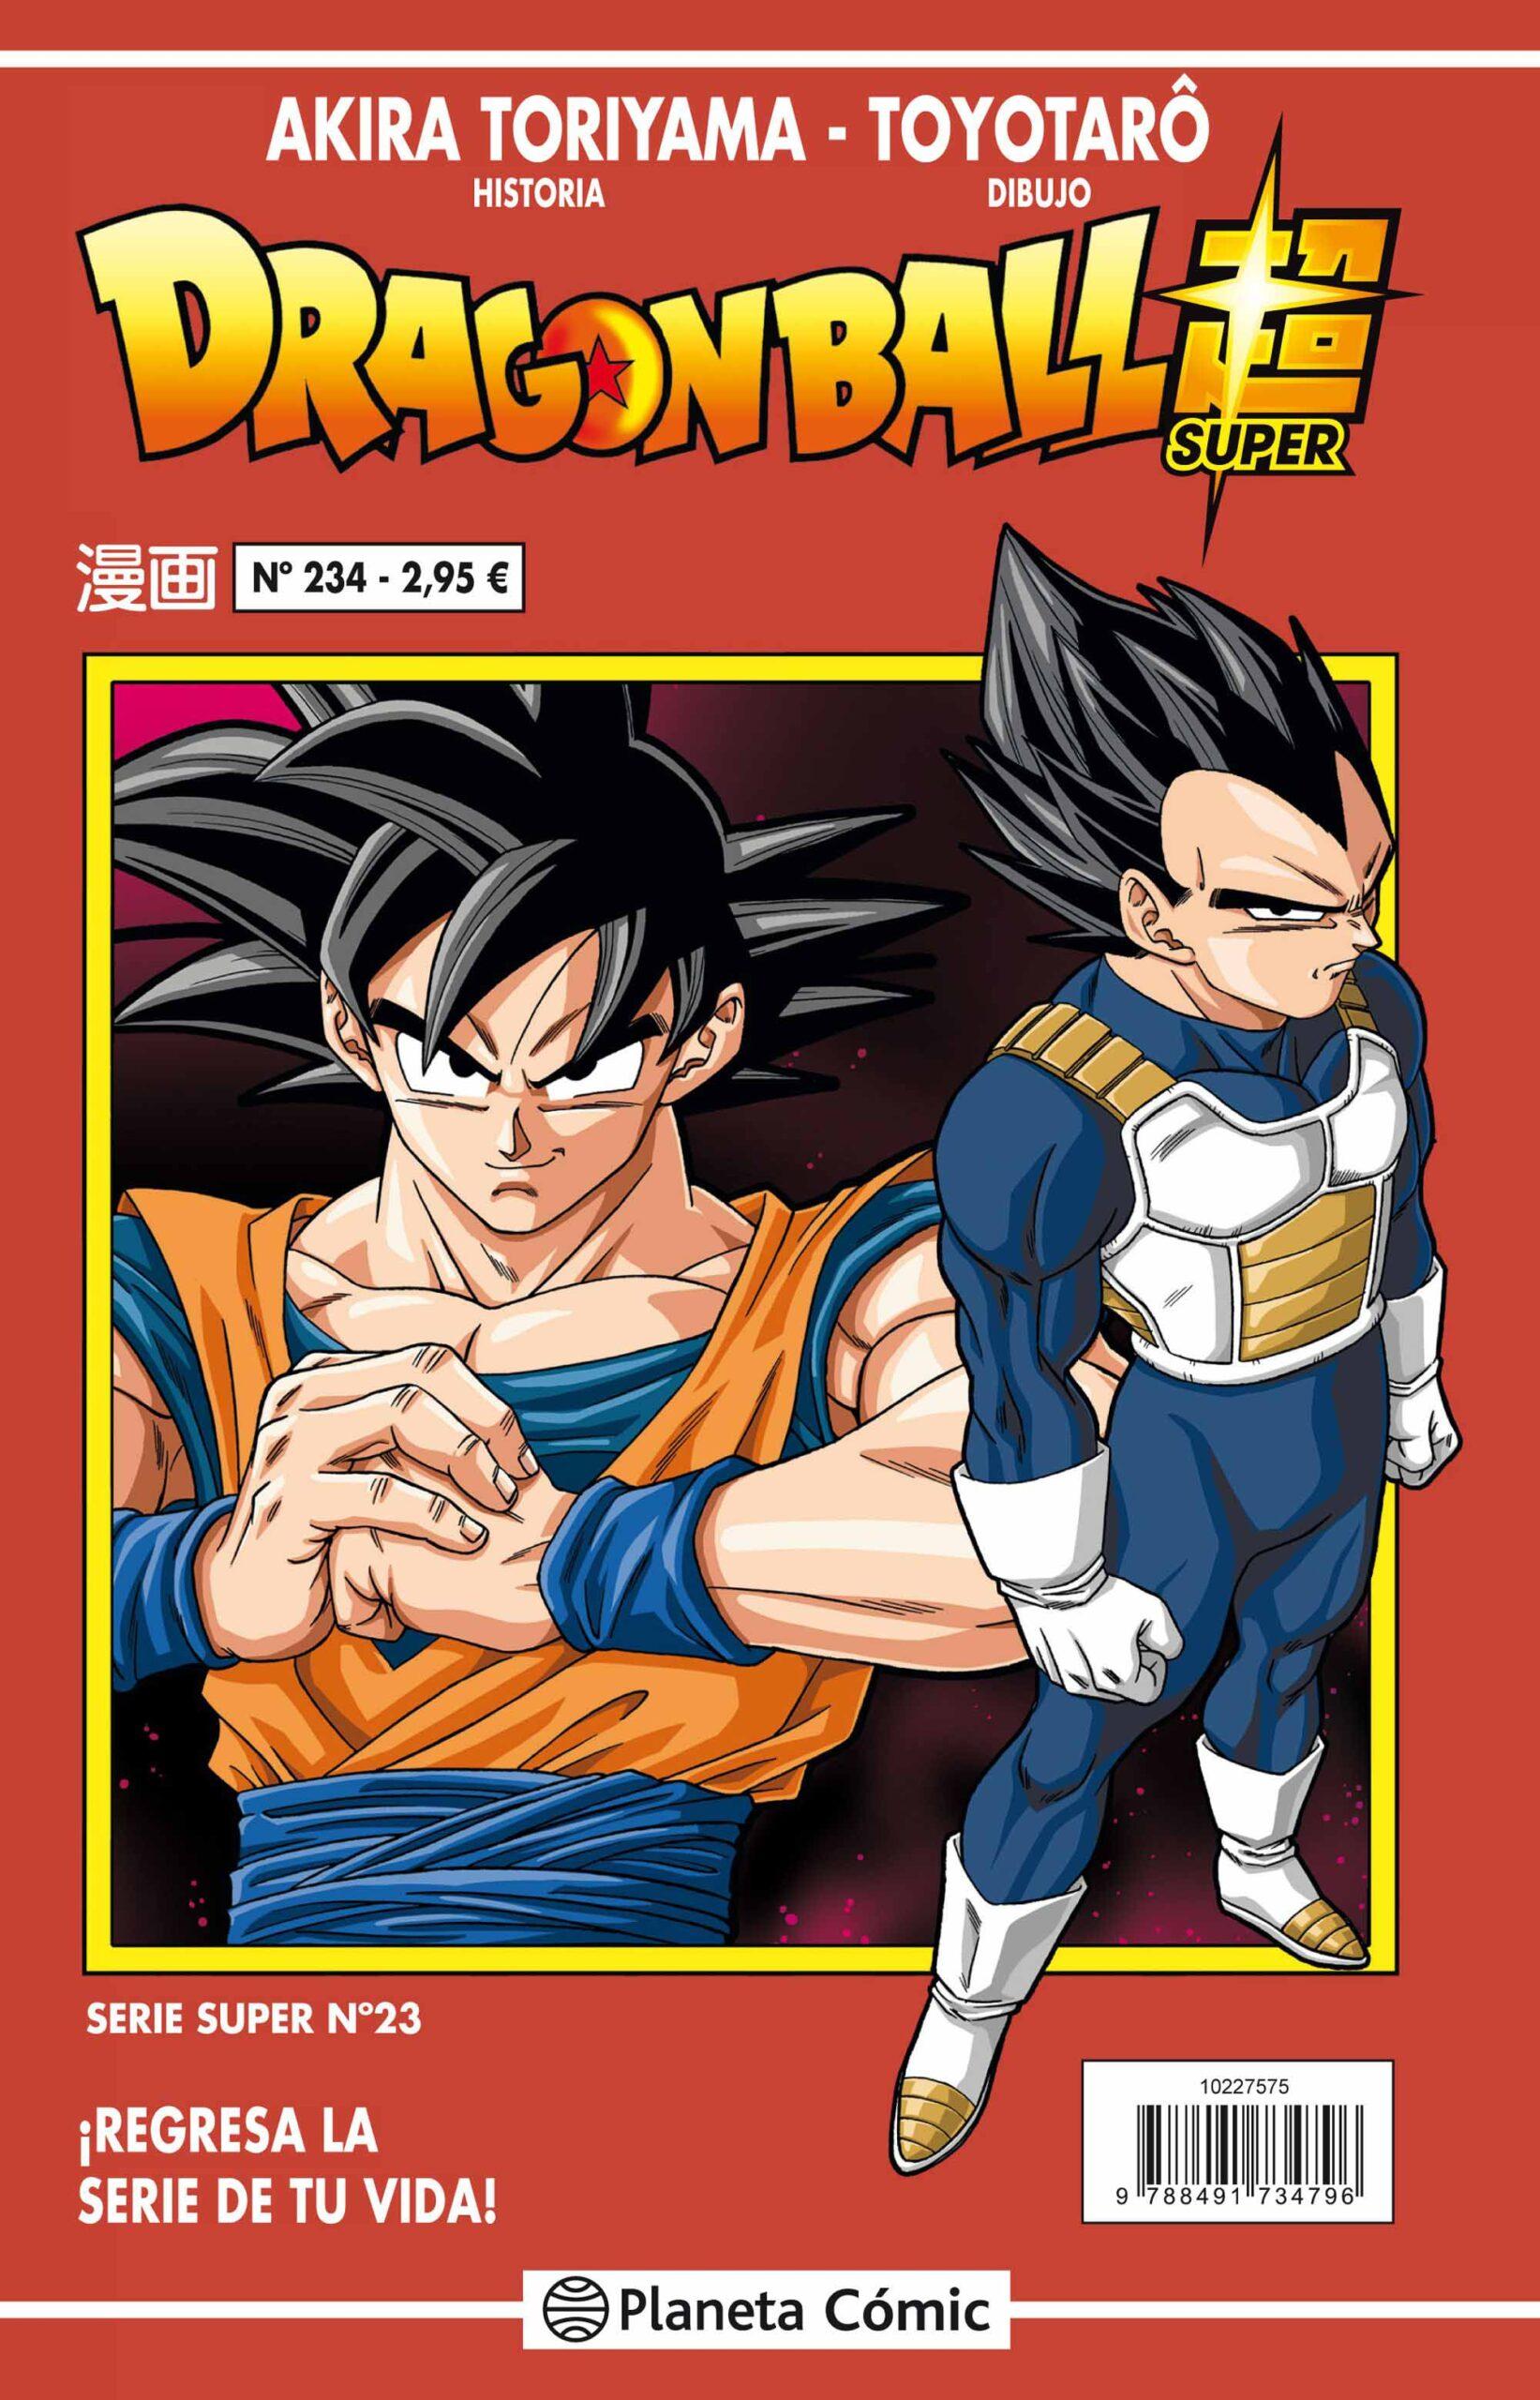 'Dragon Ball Super' 23 / 234 Serie Roja, reseña del manga